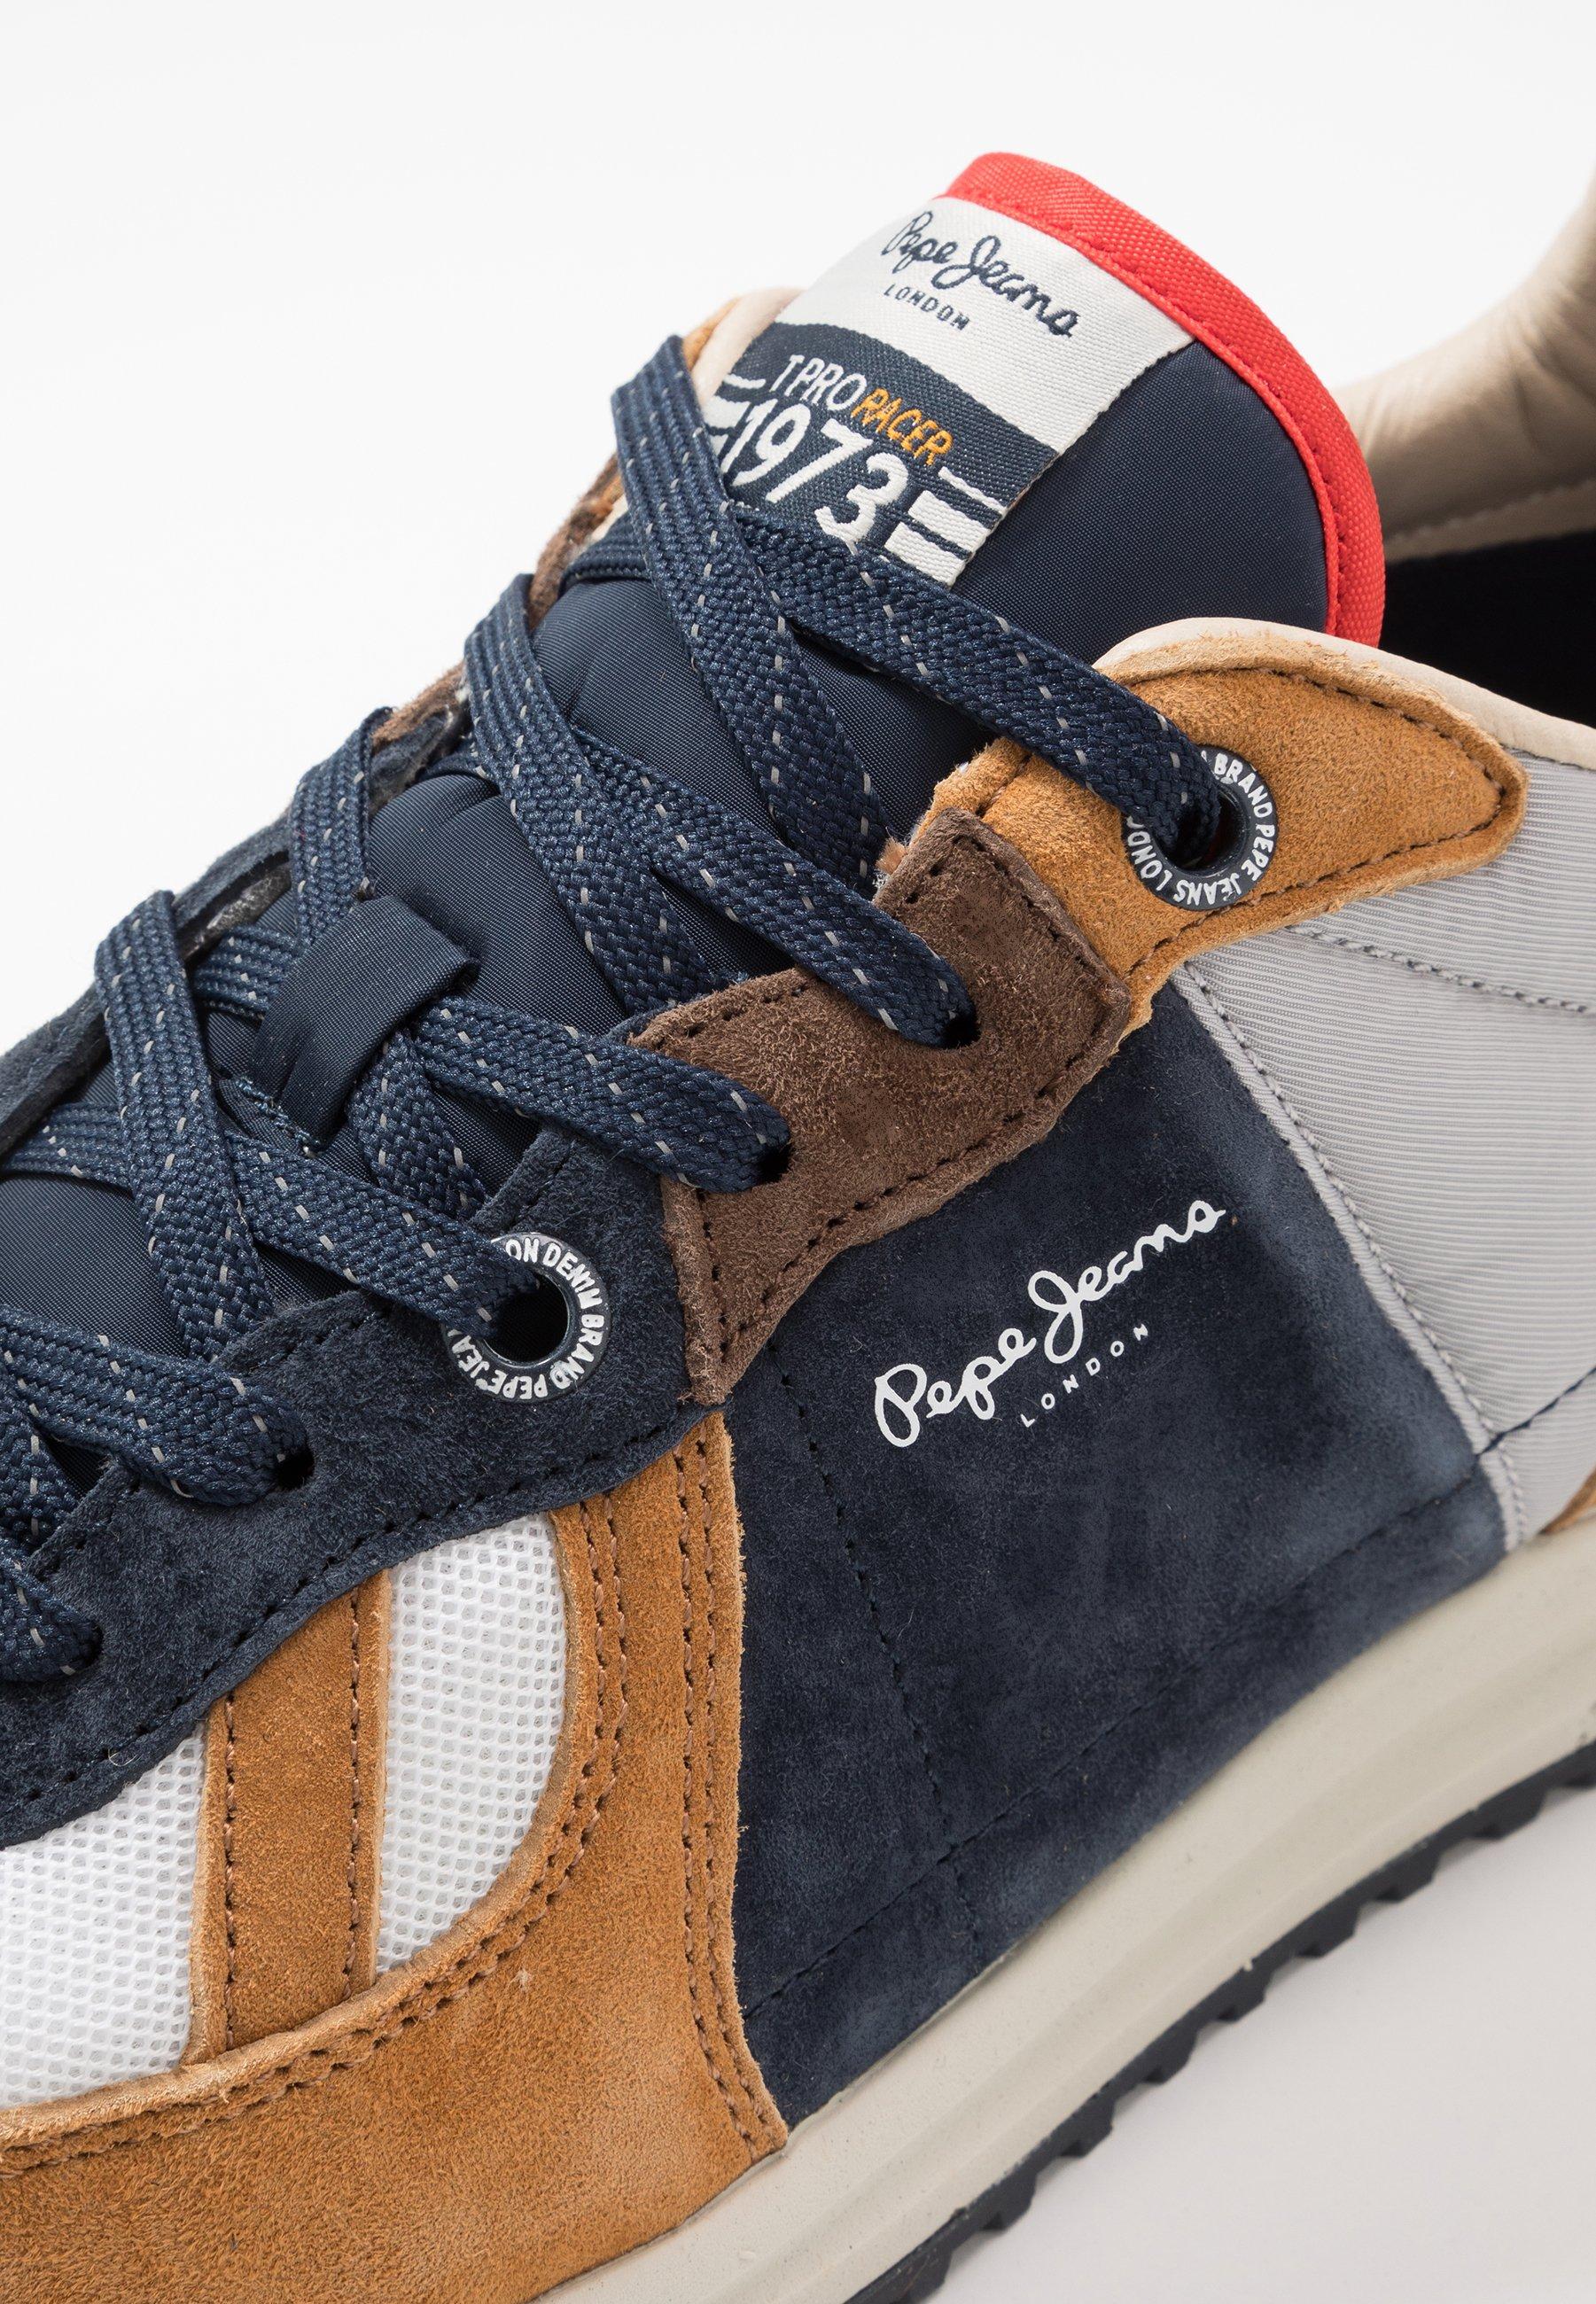 Pepe Jeans Tinker Pro Summerland - Sneakers Cognac